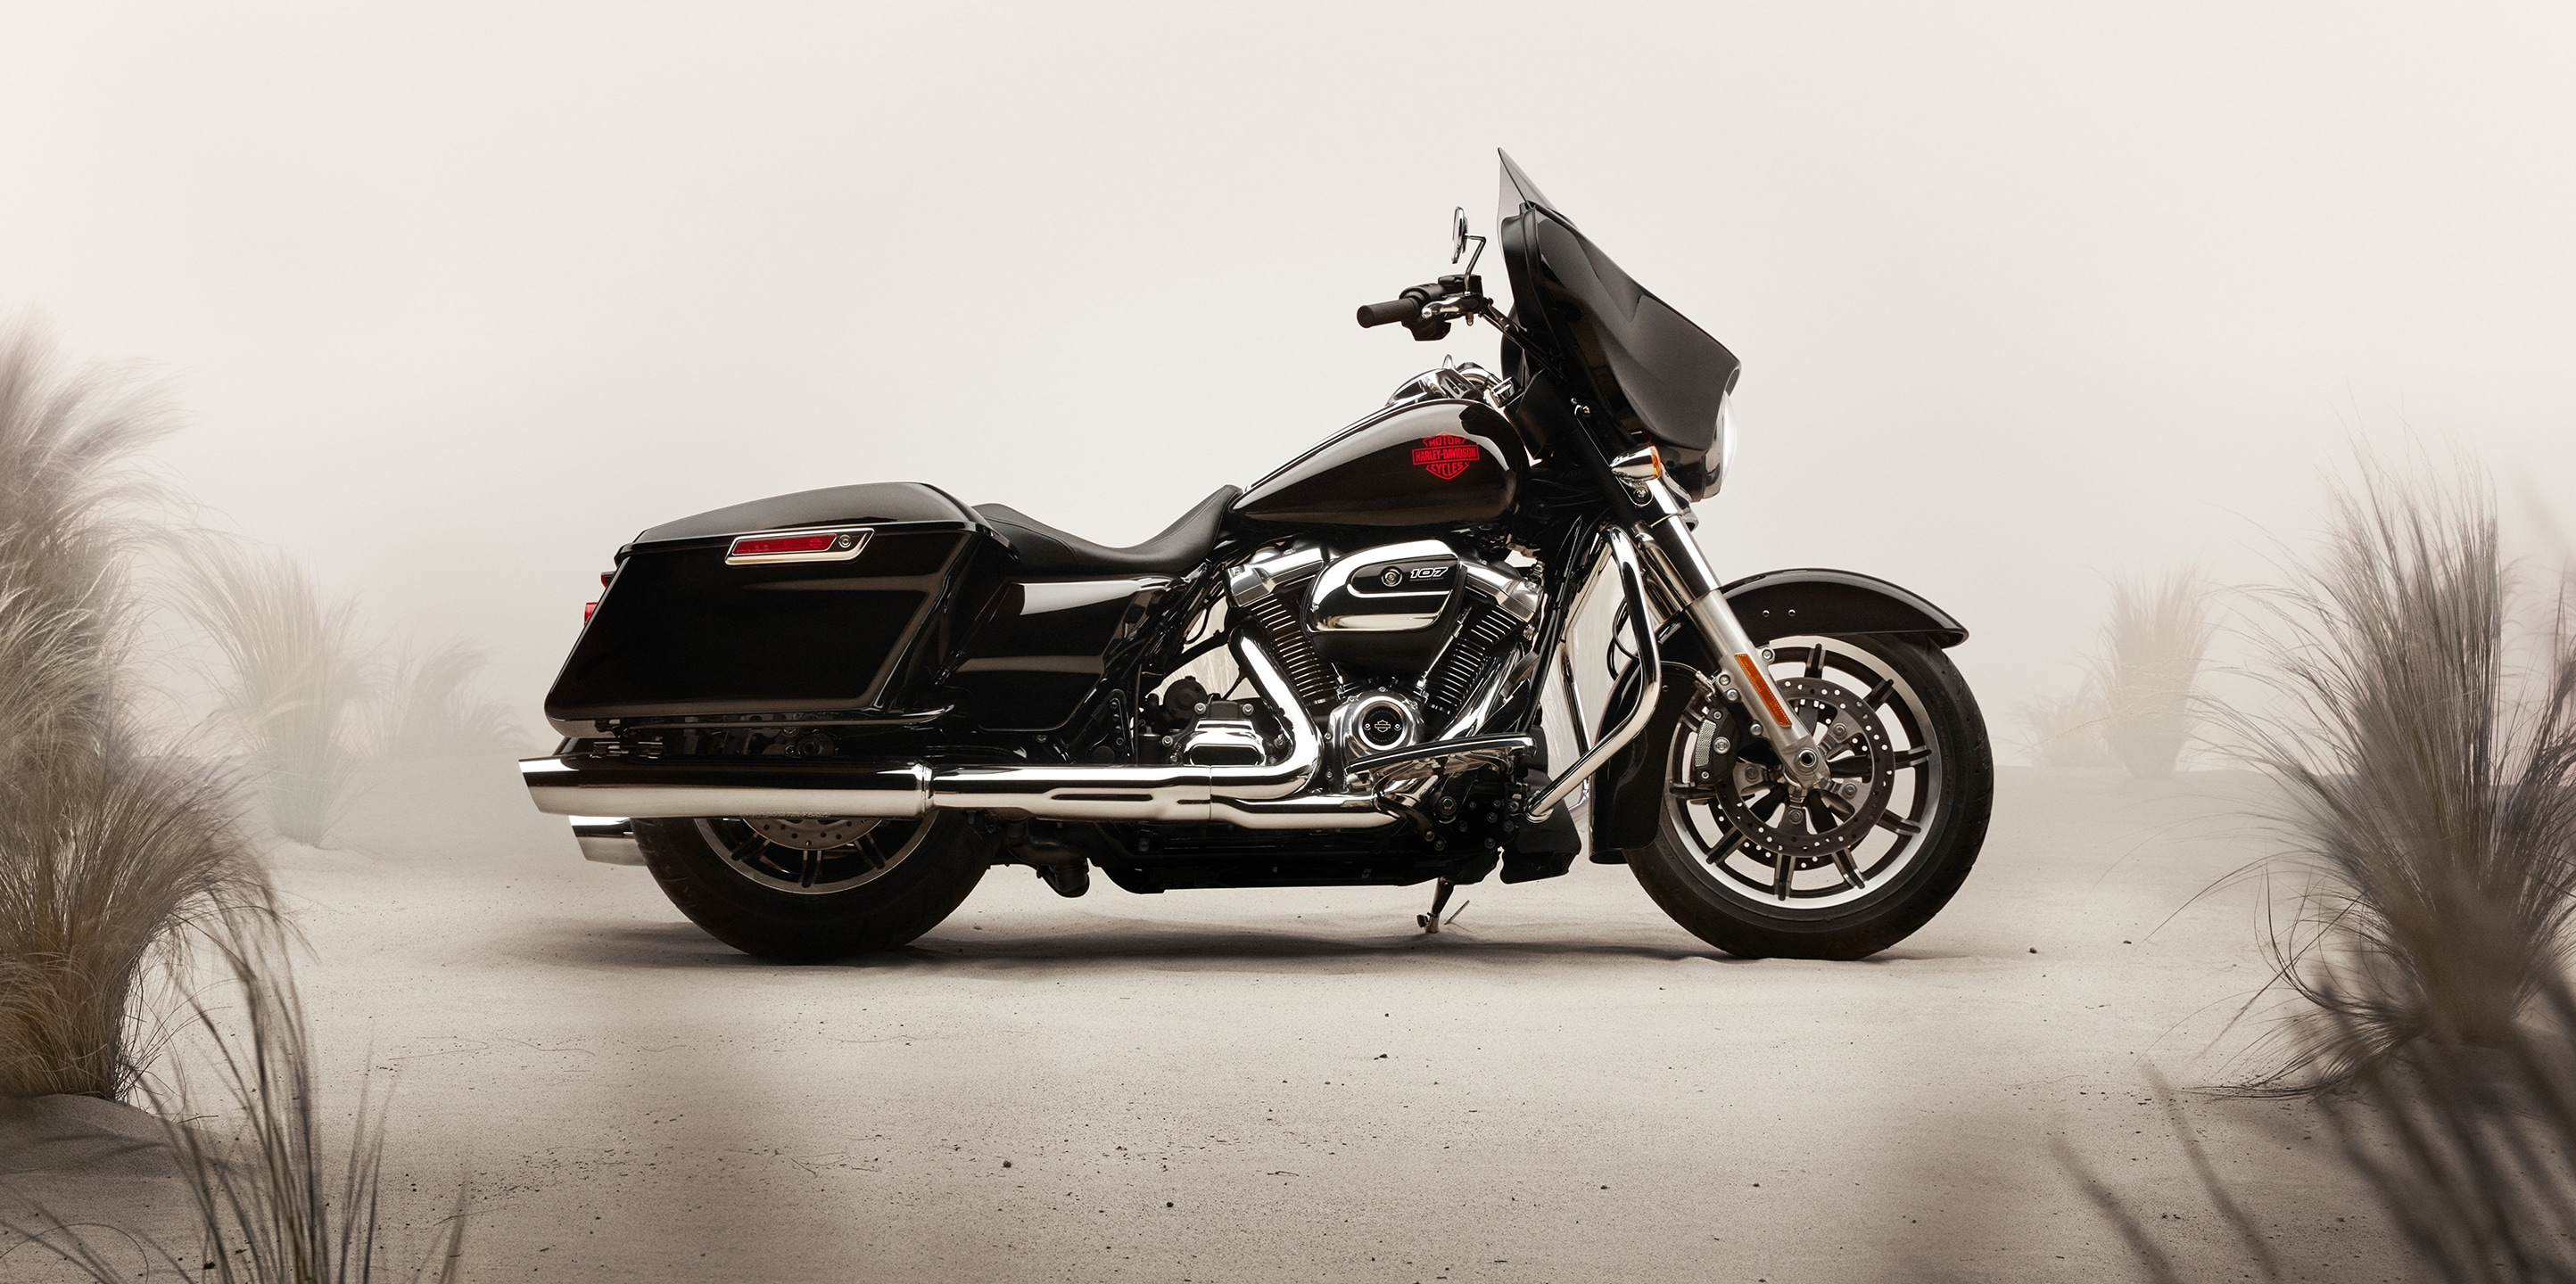 2020 Electra Glide Standard Motorrad | Harley Davidson ...